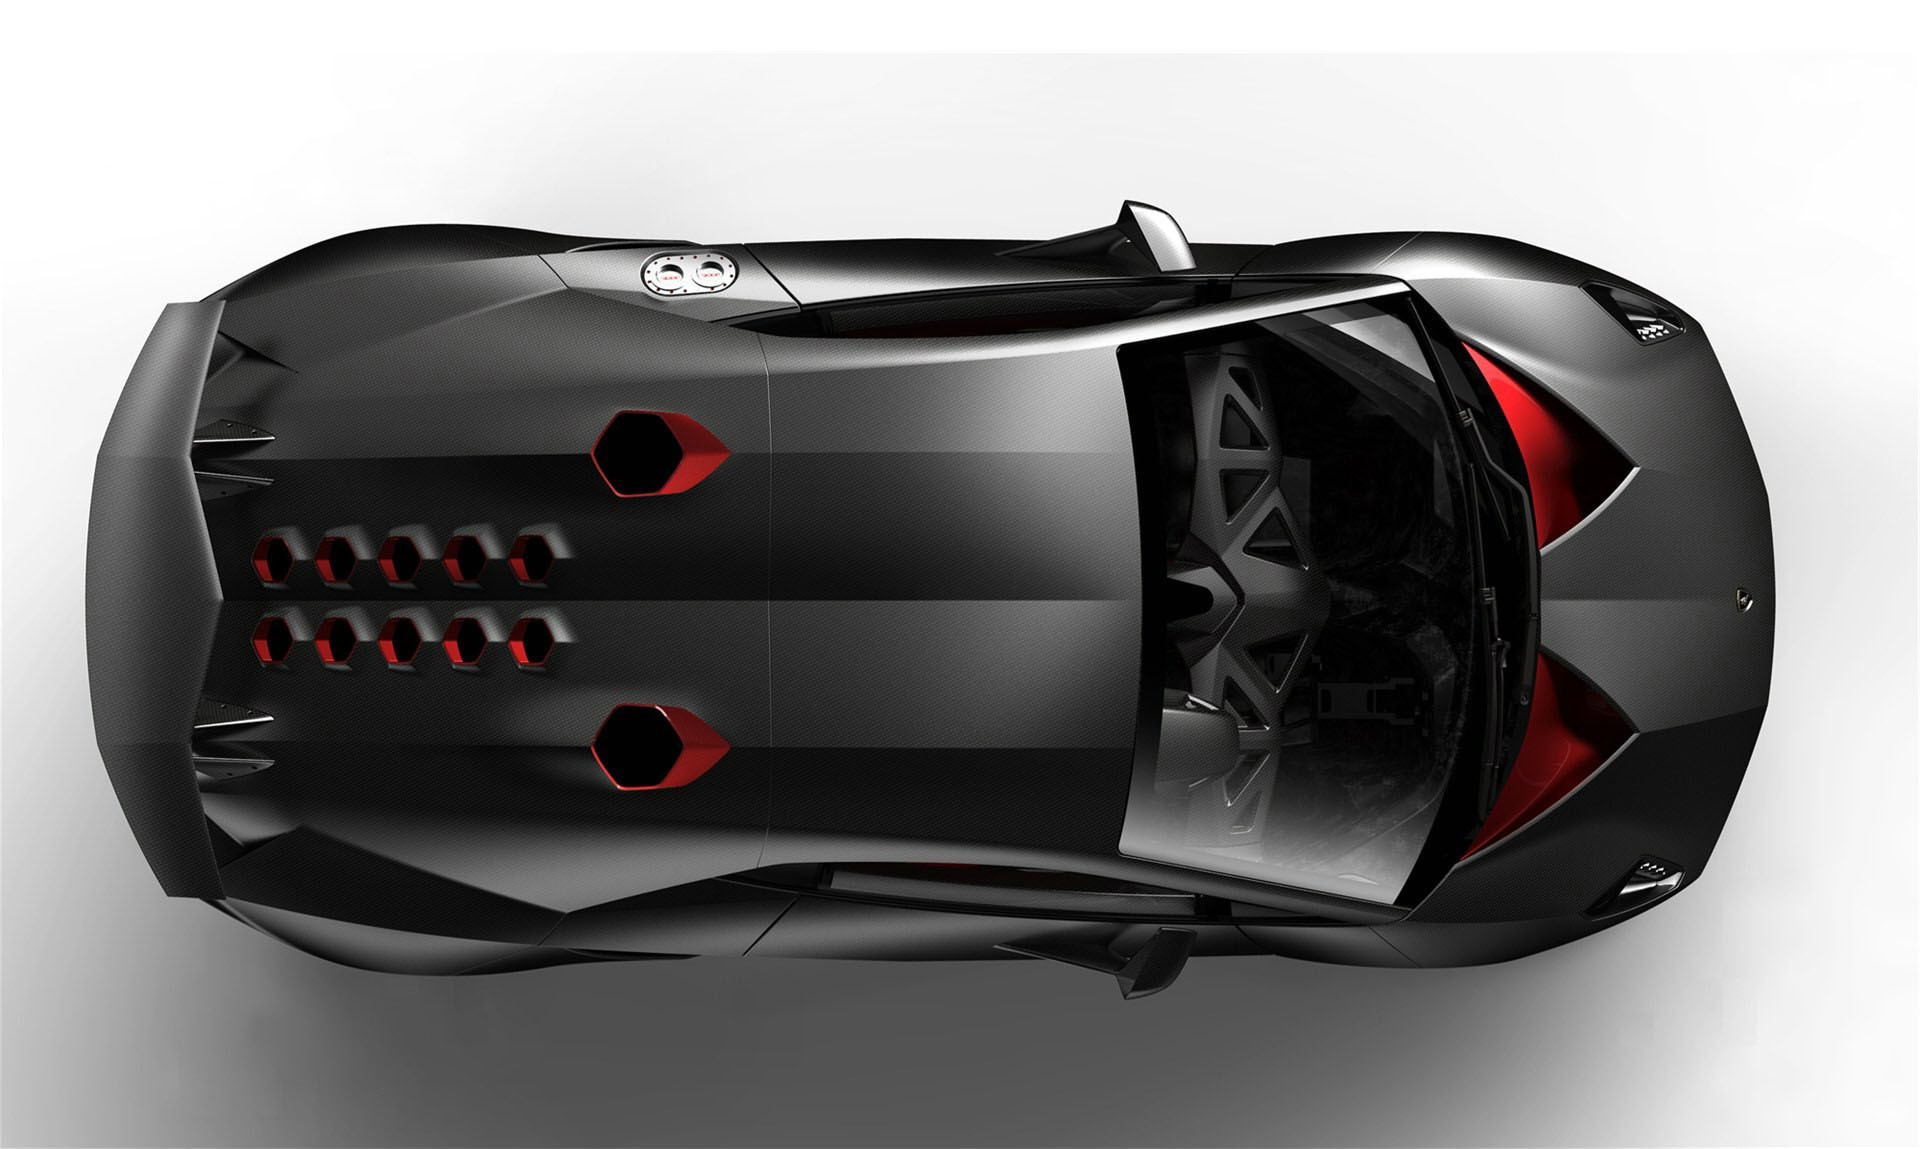 Lamborghini Sesto Elemento Side Anime Aerography Car 2014